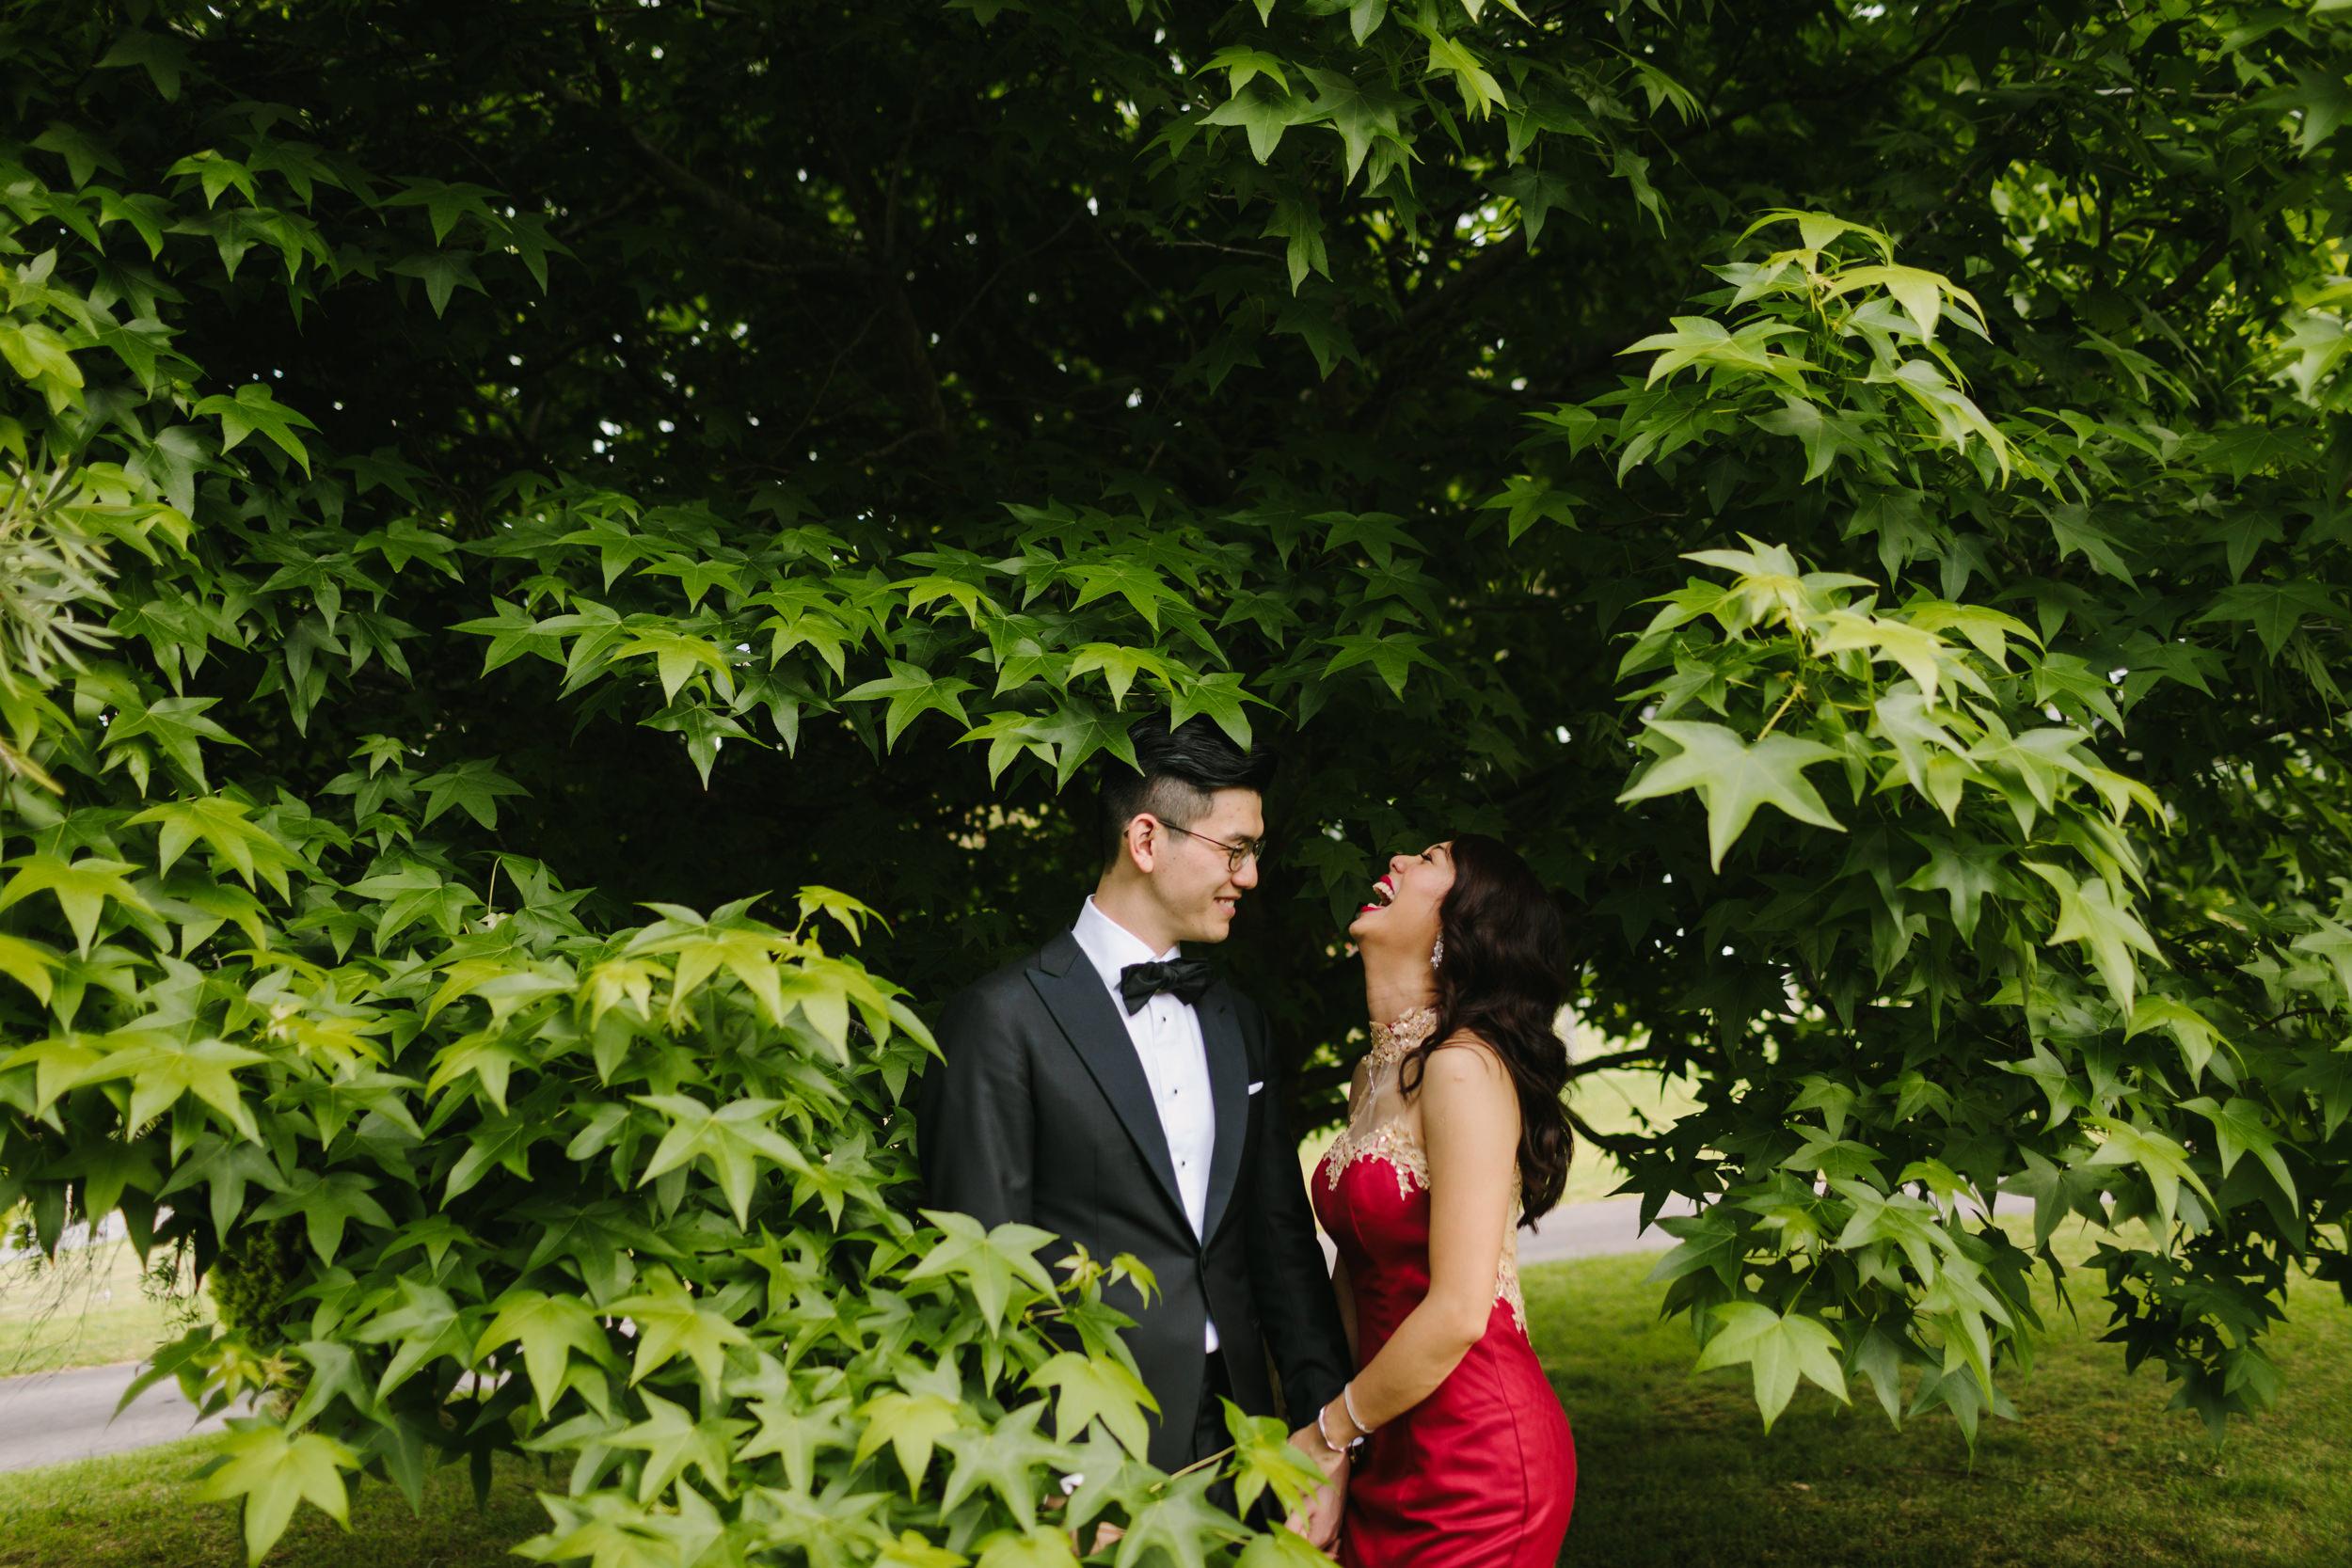 Melbourne Winery Wedding Daryl & Adeline 91.JPG